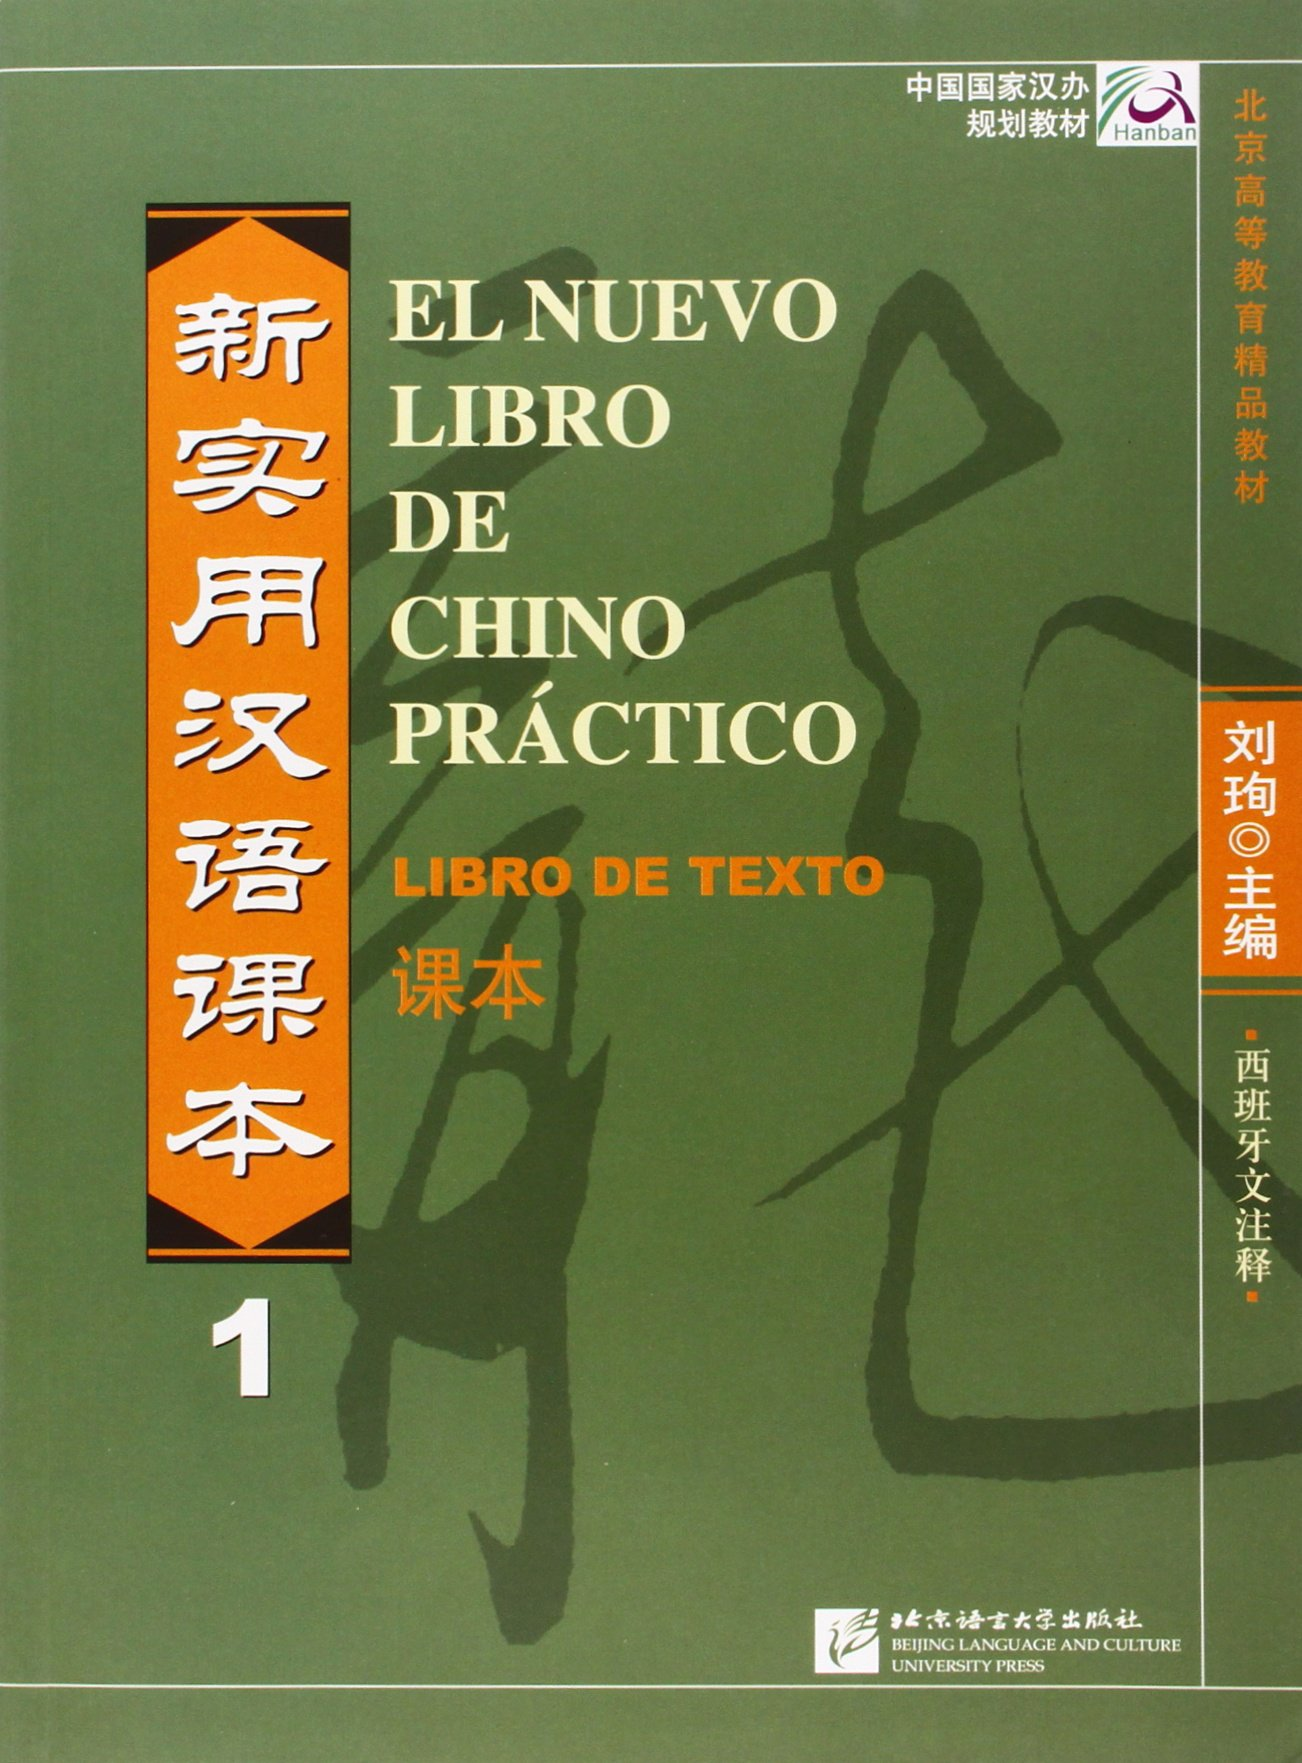 El nuevo libro de chino practico vol.1 - Libro de texto (Spanish Language) (Chino) Tapa blanda – 1 dic 2008 Xun Liu China 7561922272 Begleitmaterial